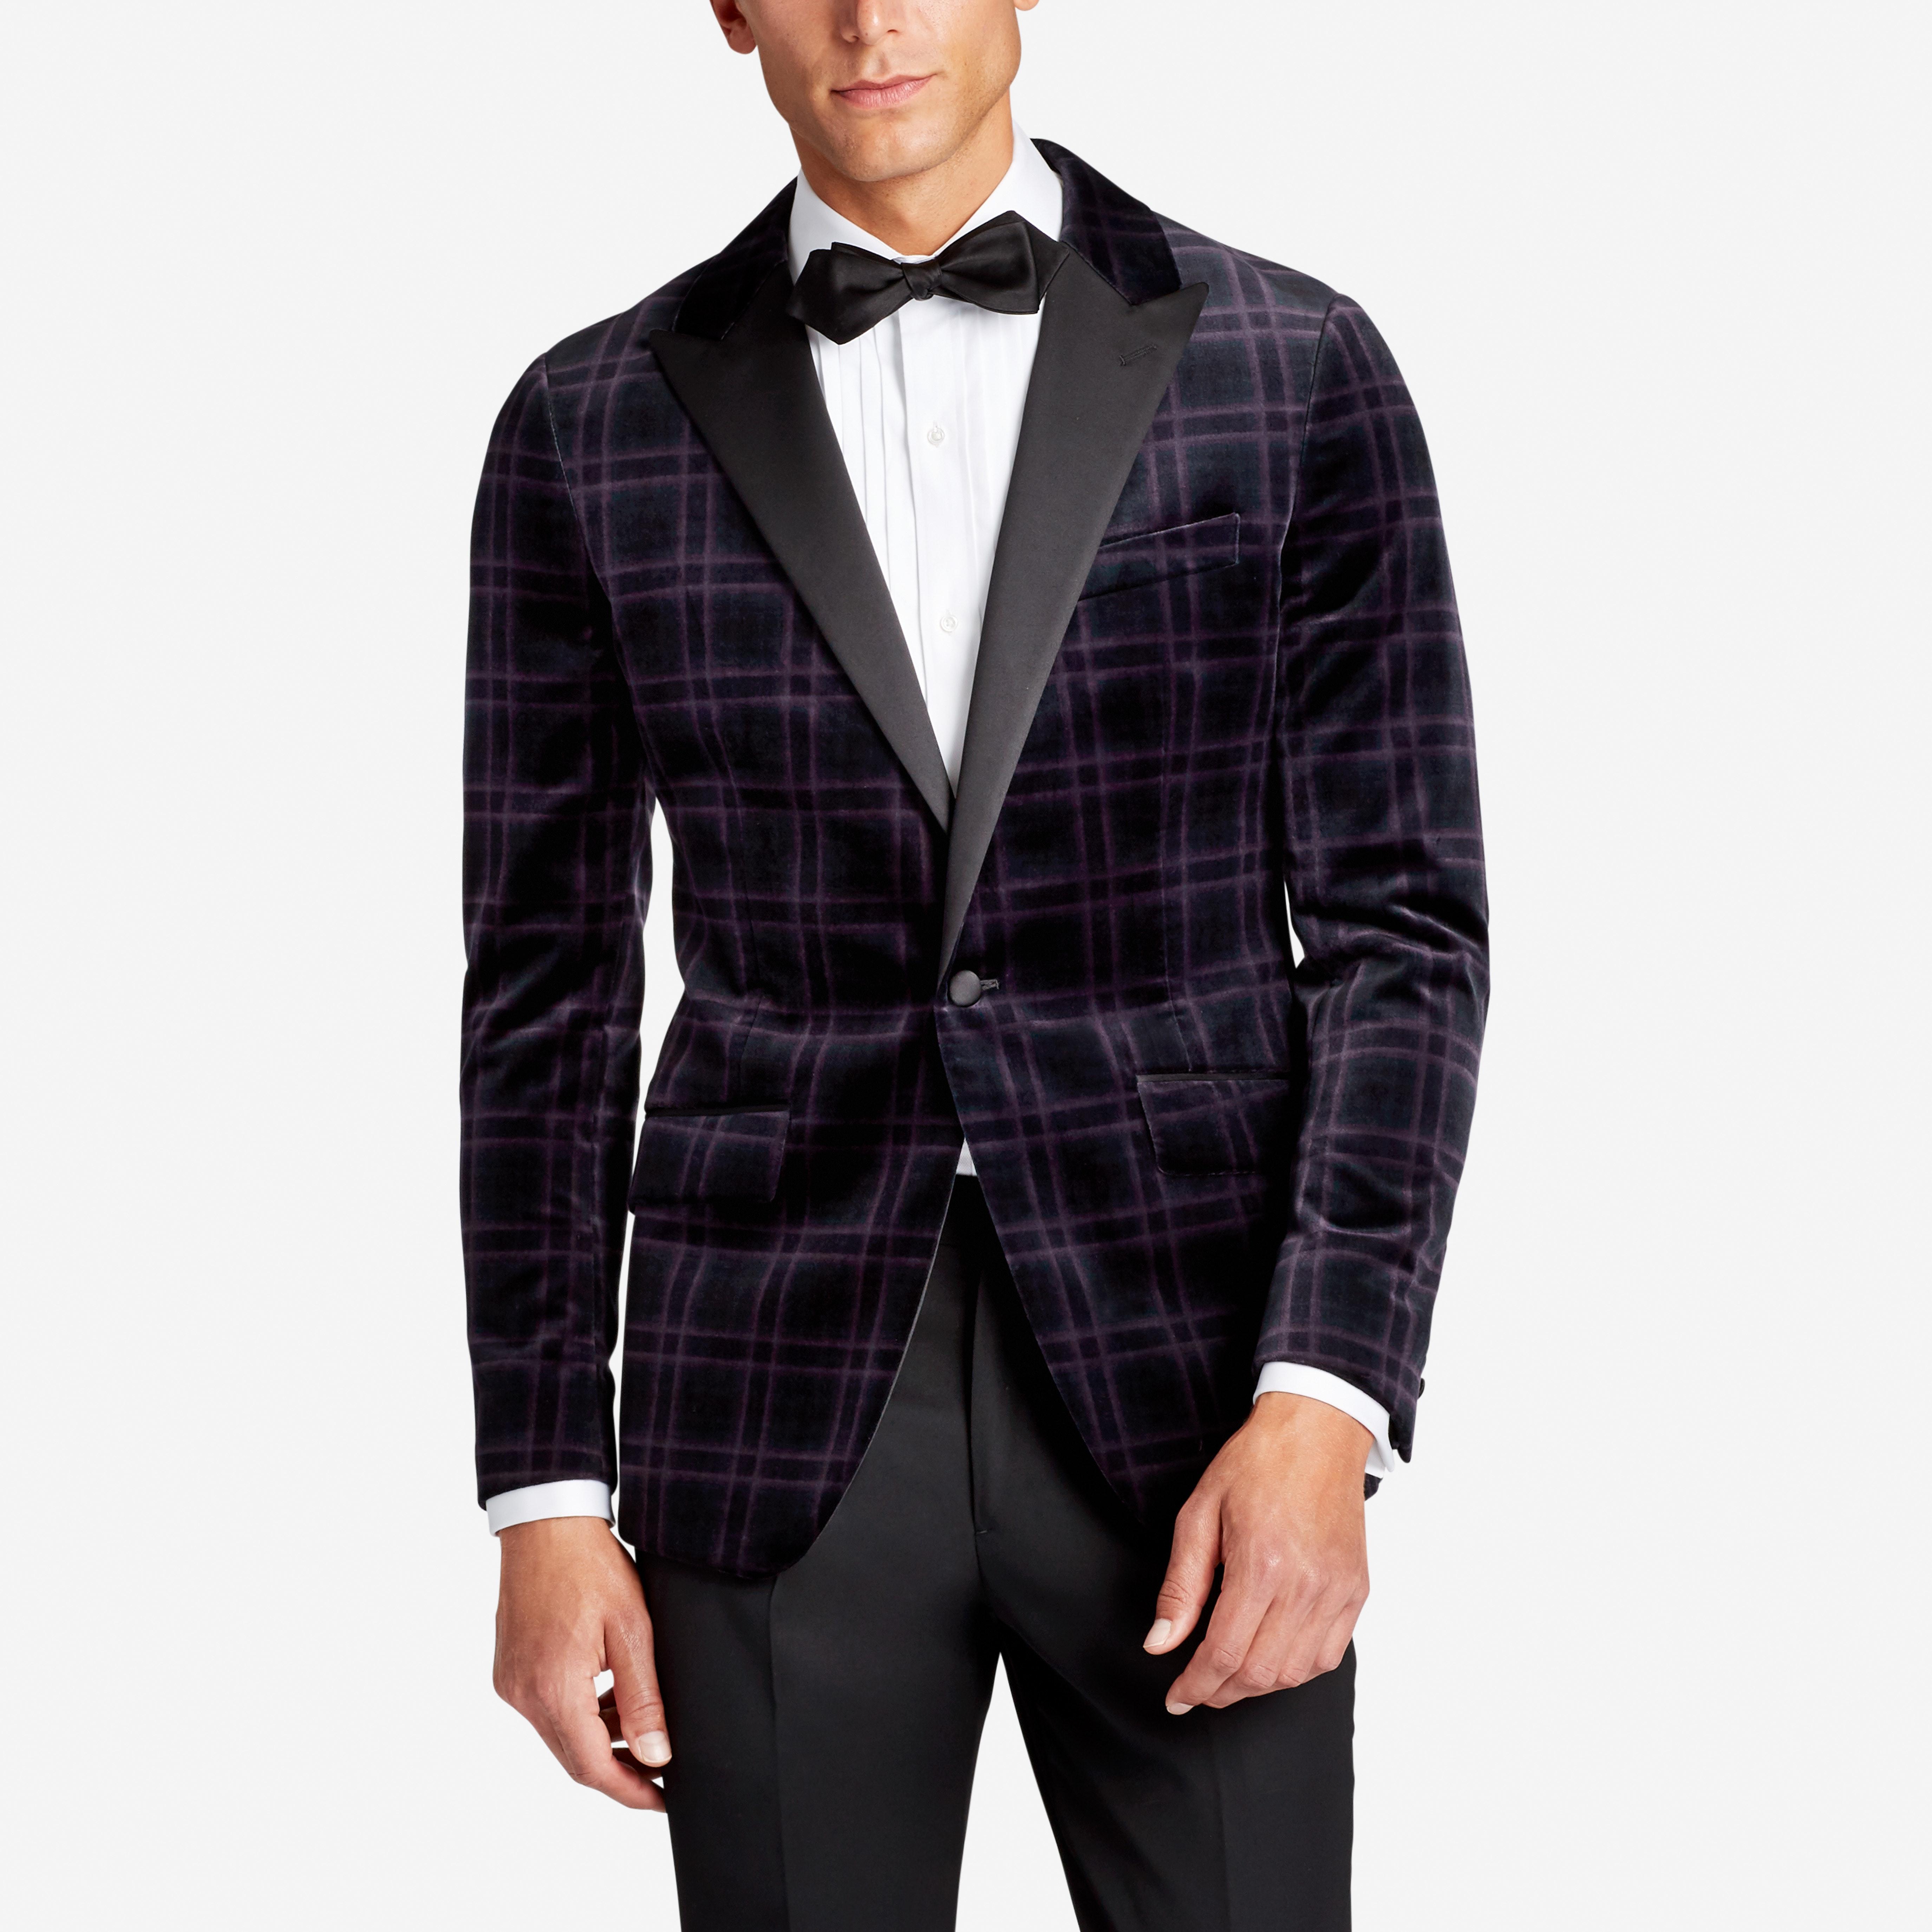 The Capstone Italian Velvet Tuxedo Jacket